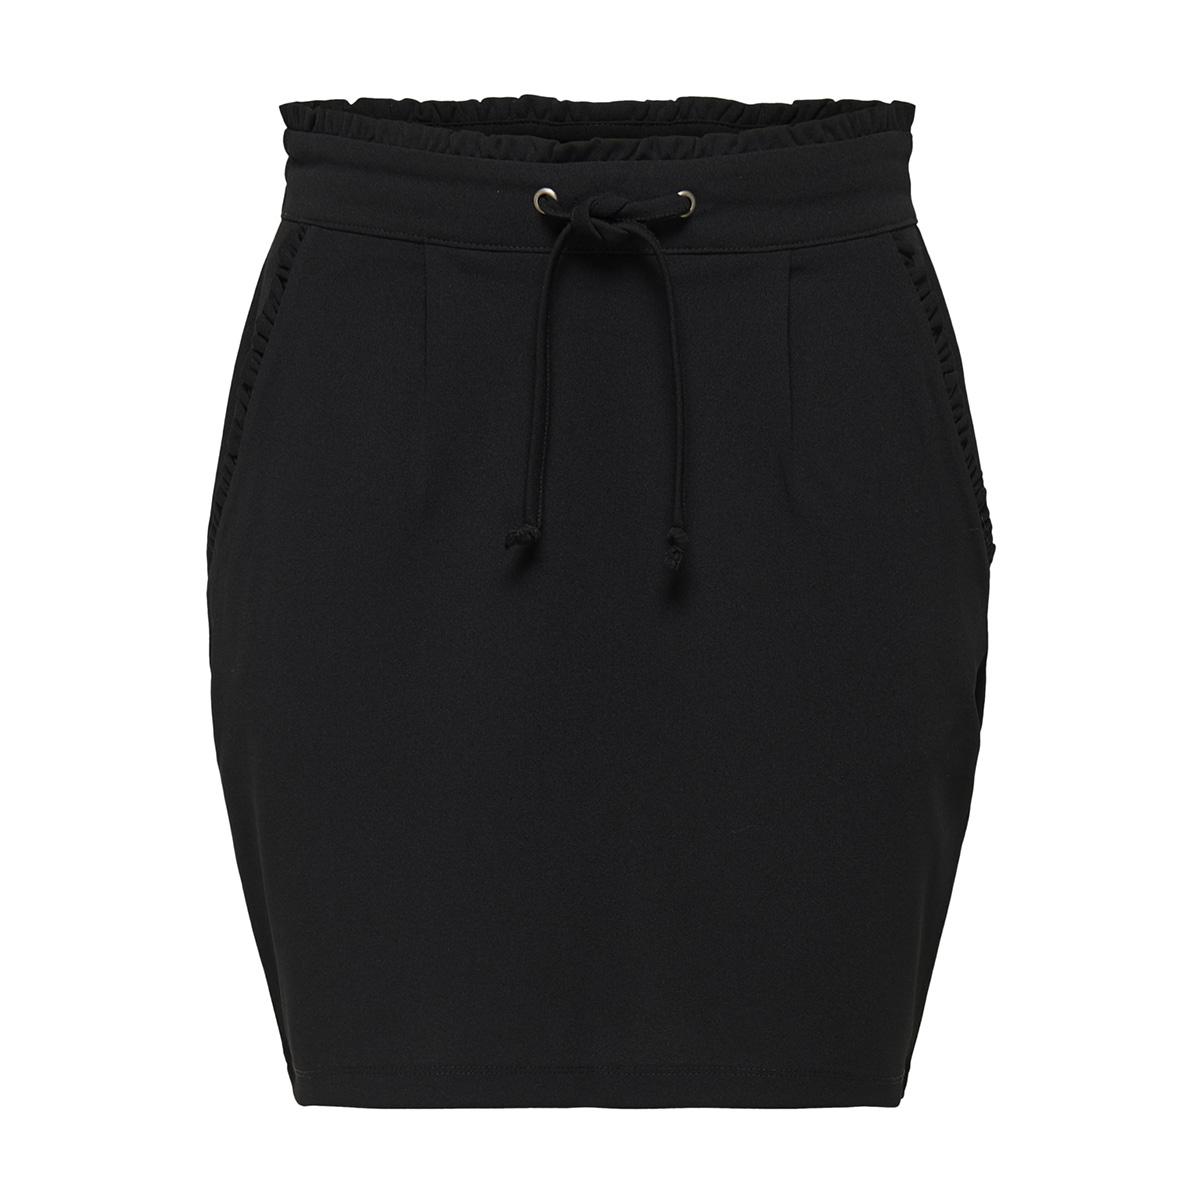 jdycatia treats skirt jrs 15177202 jacqueline de yong rok black